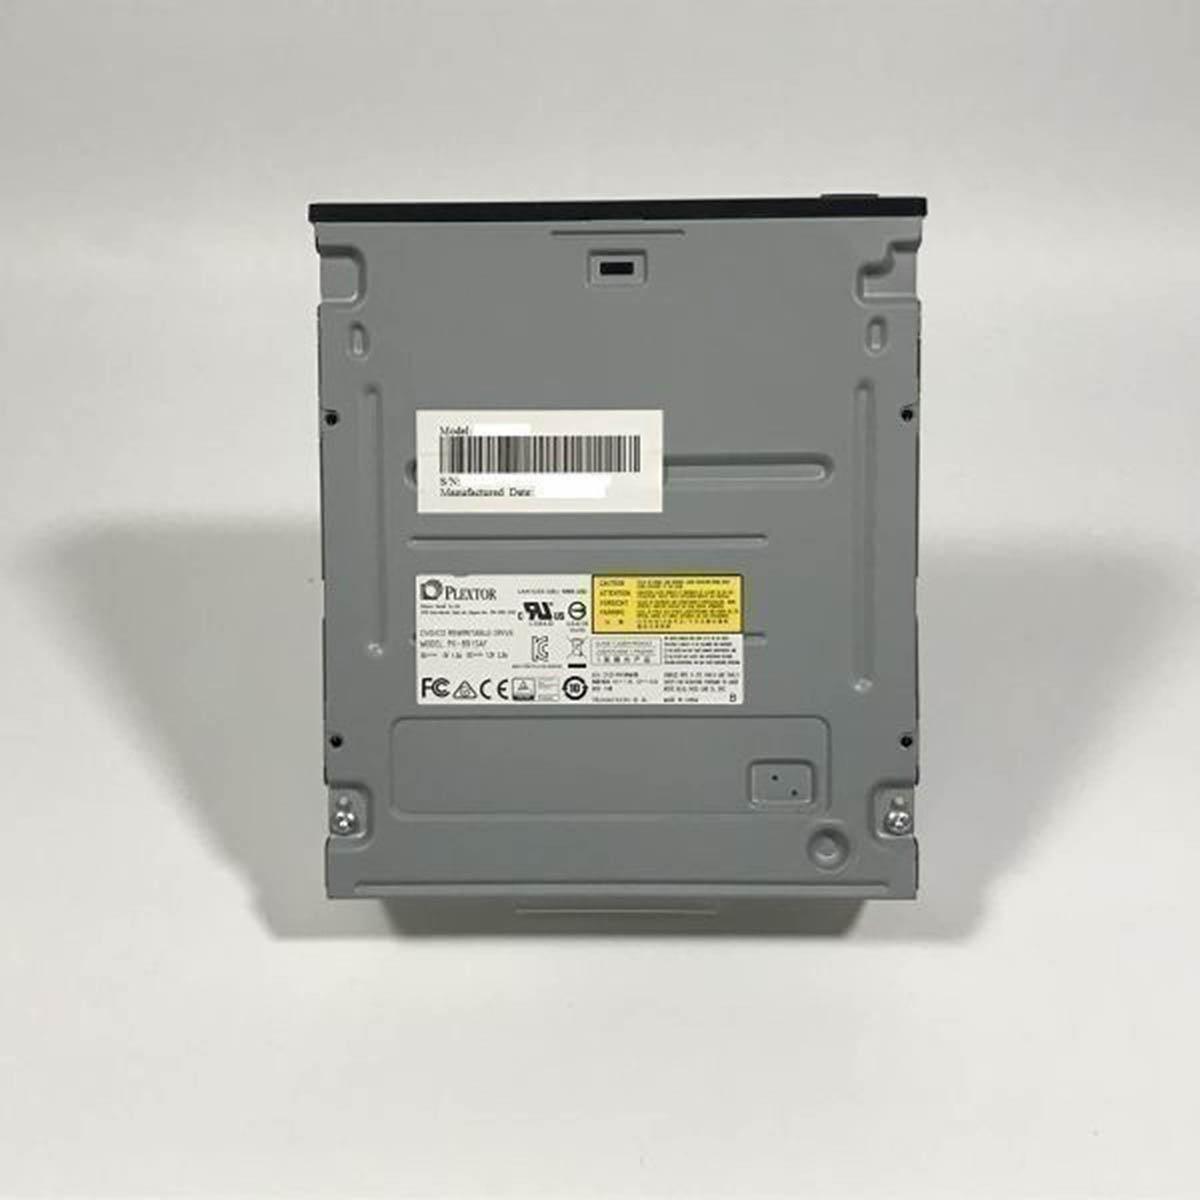 plextor m5pro ファームウェア 1.08